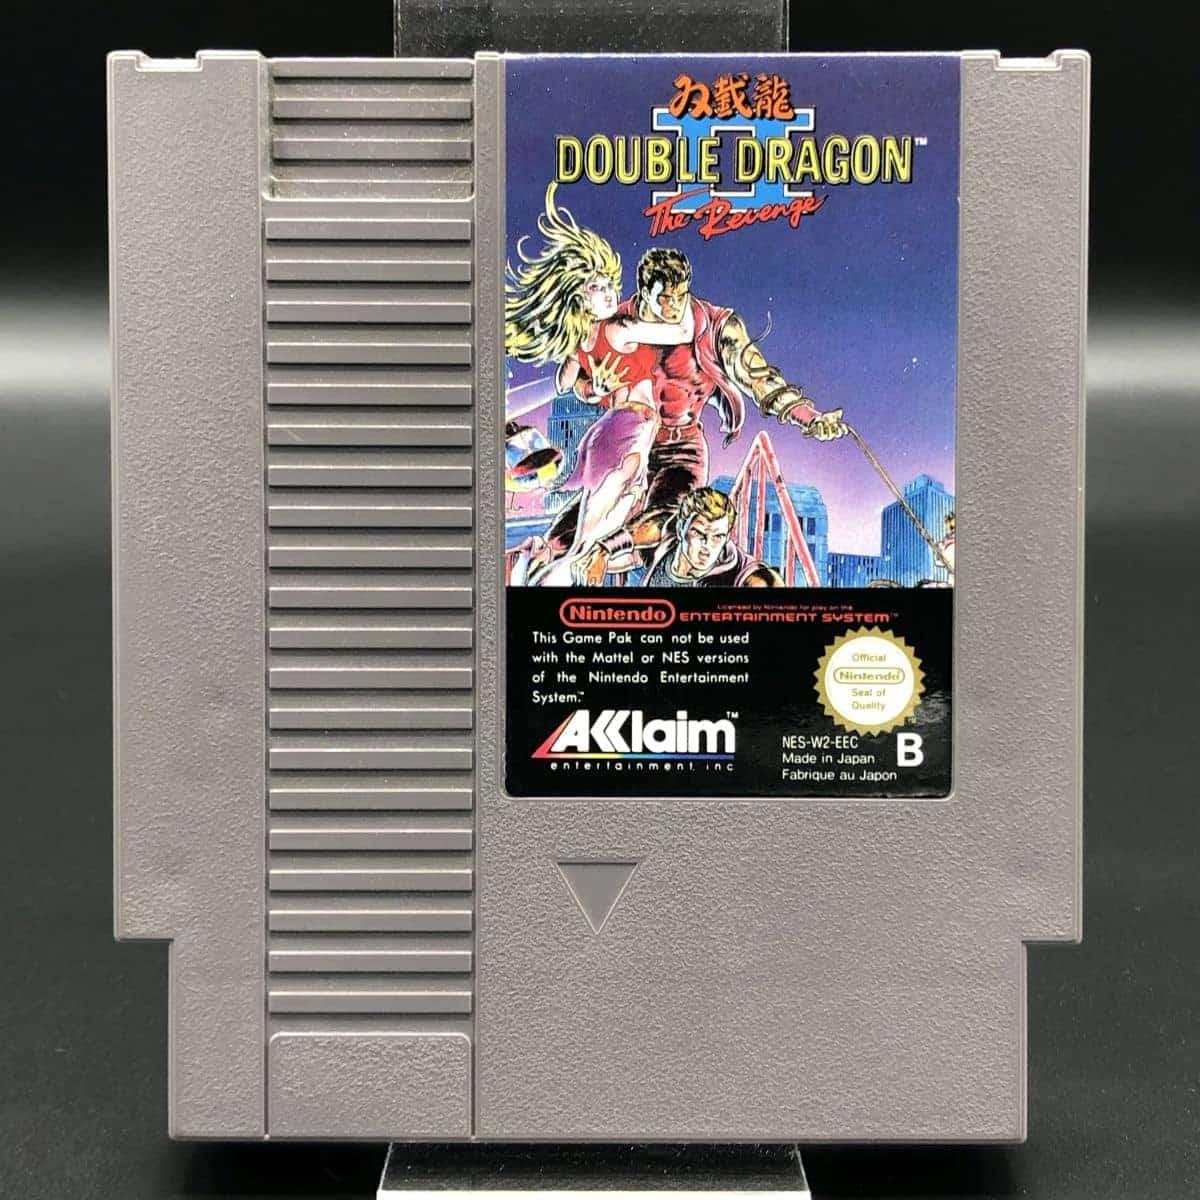 NES Double Dragon II: The Revenge (Modul) (Sehr gut) Nintendo Entertainment System